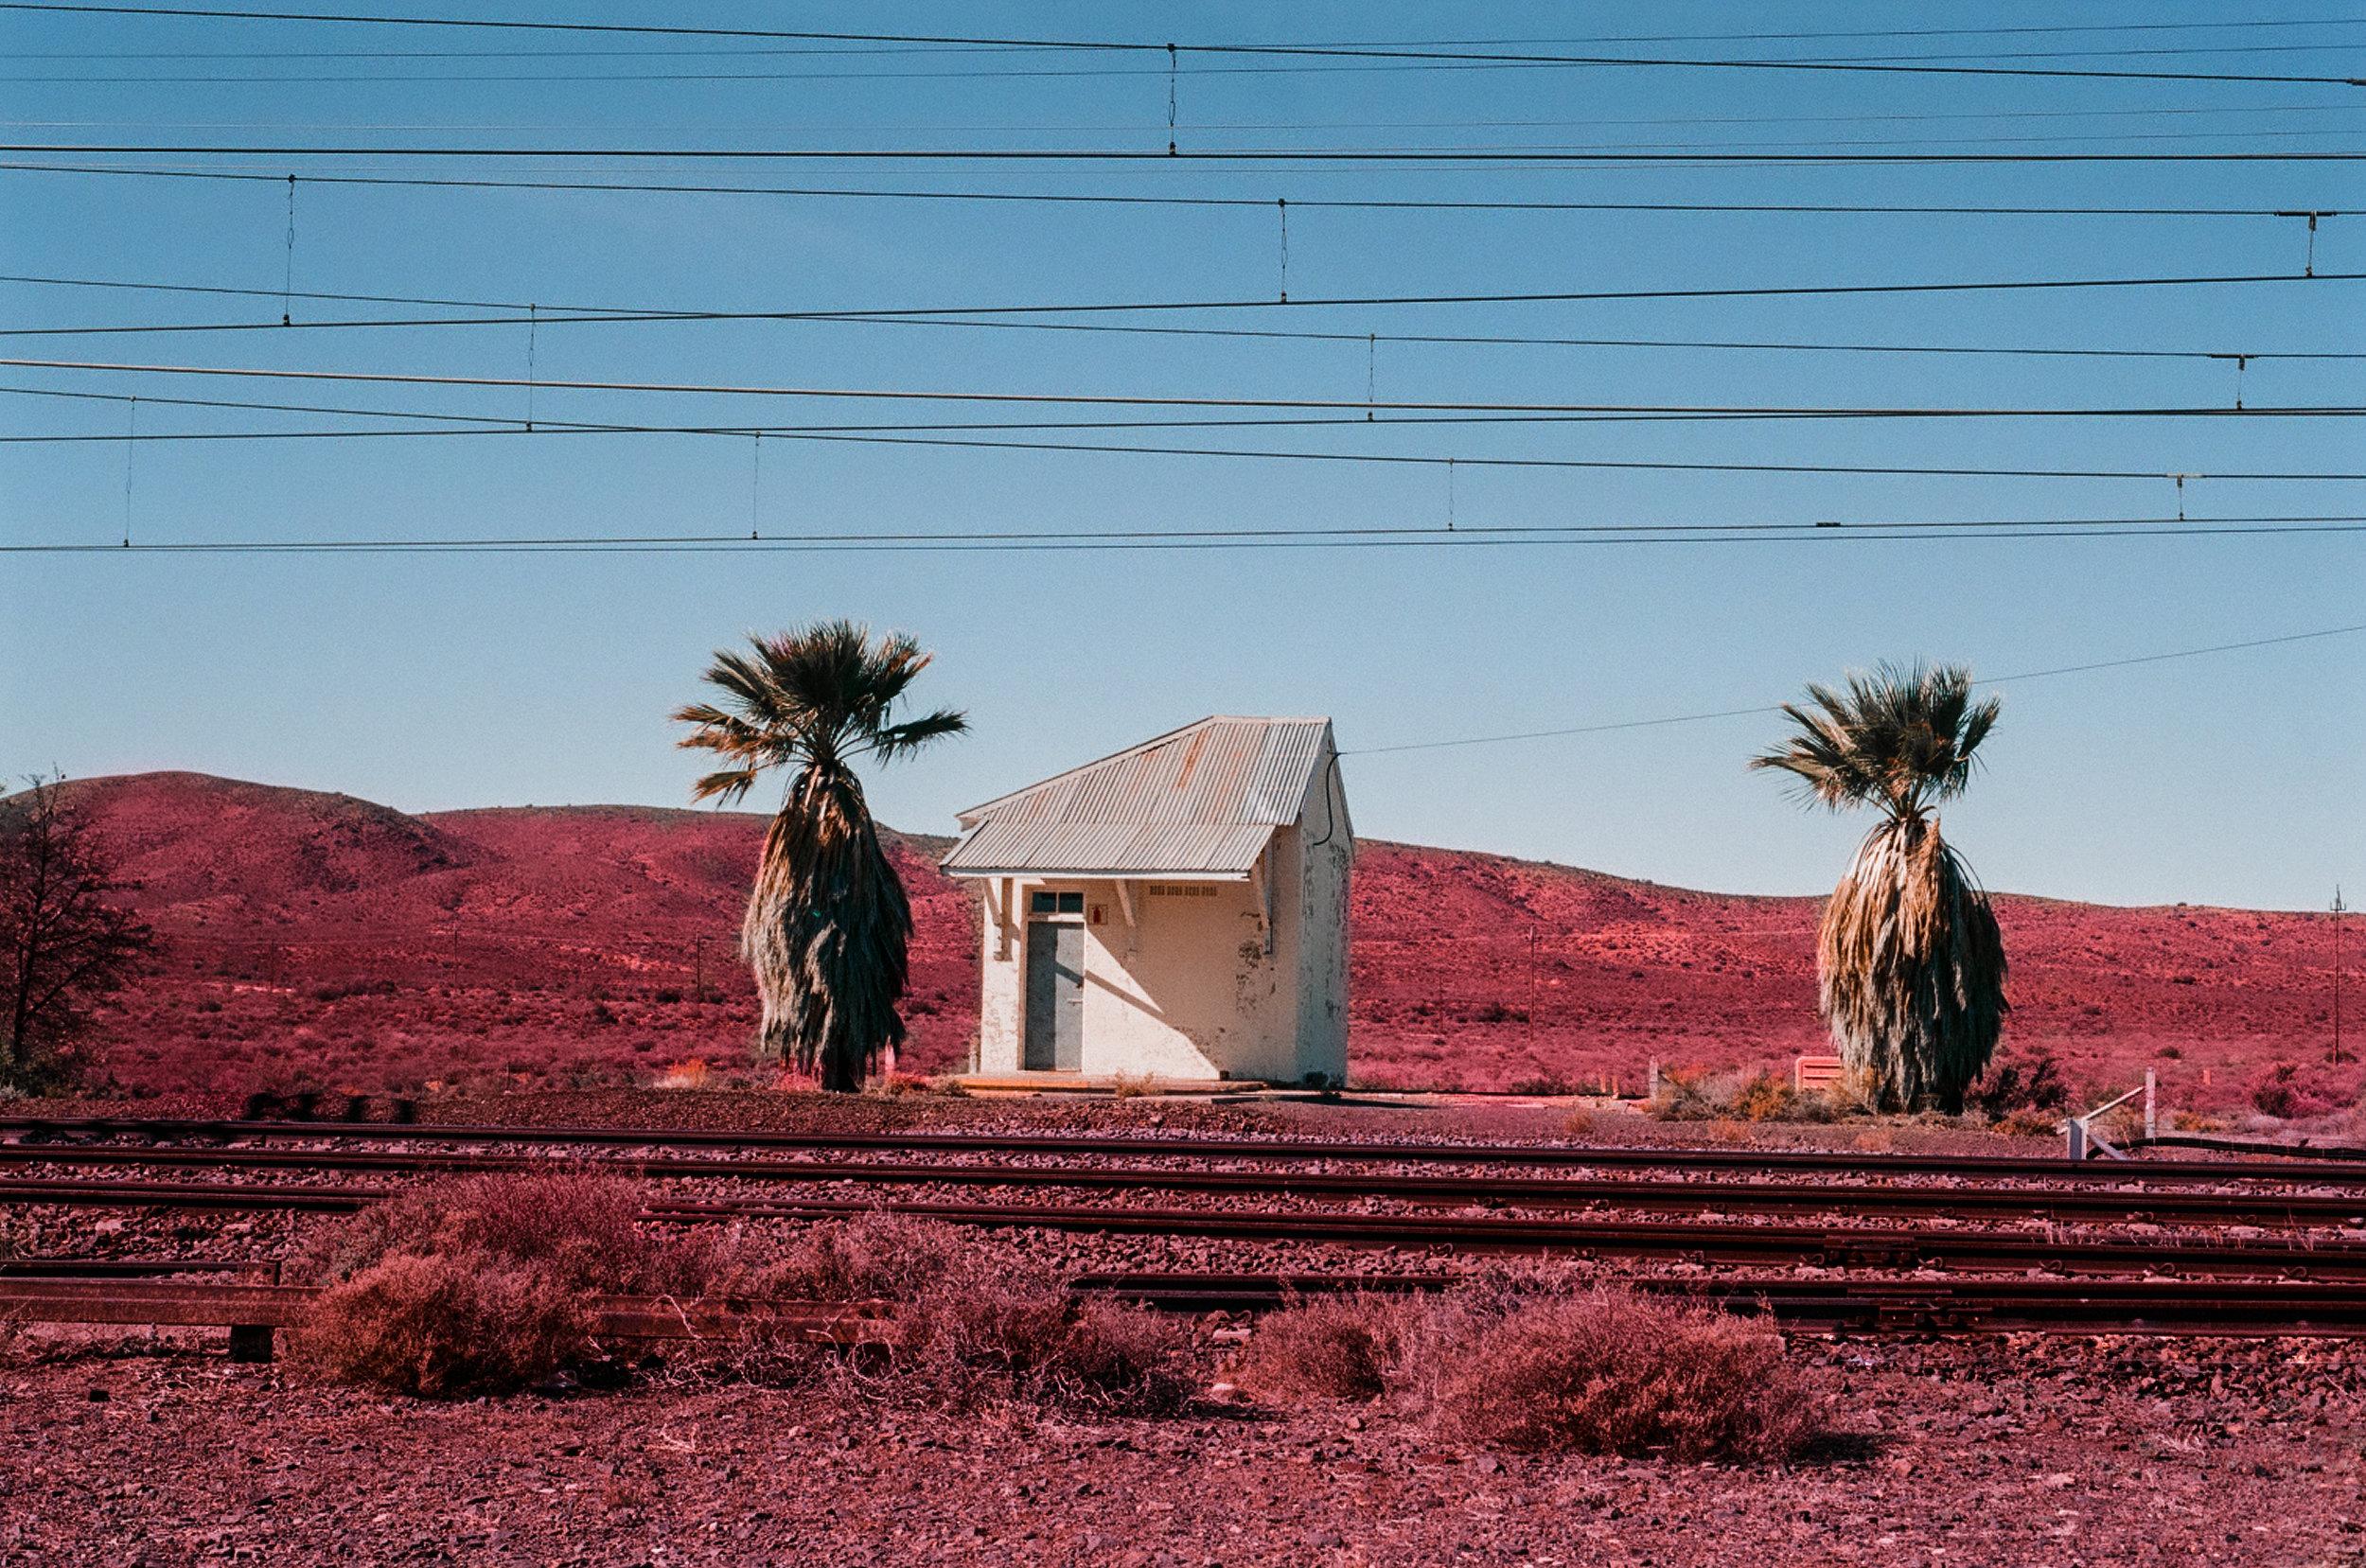 April 2019 | Durban, Roadtrip, Thandi | 35mm Edited -2.jpg